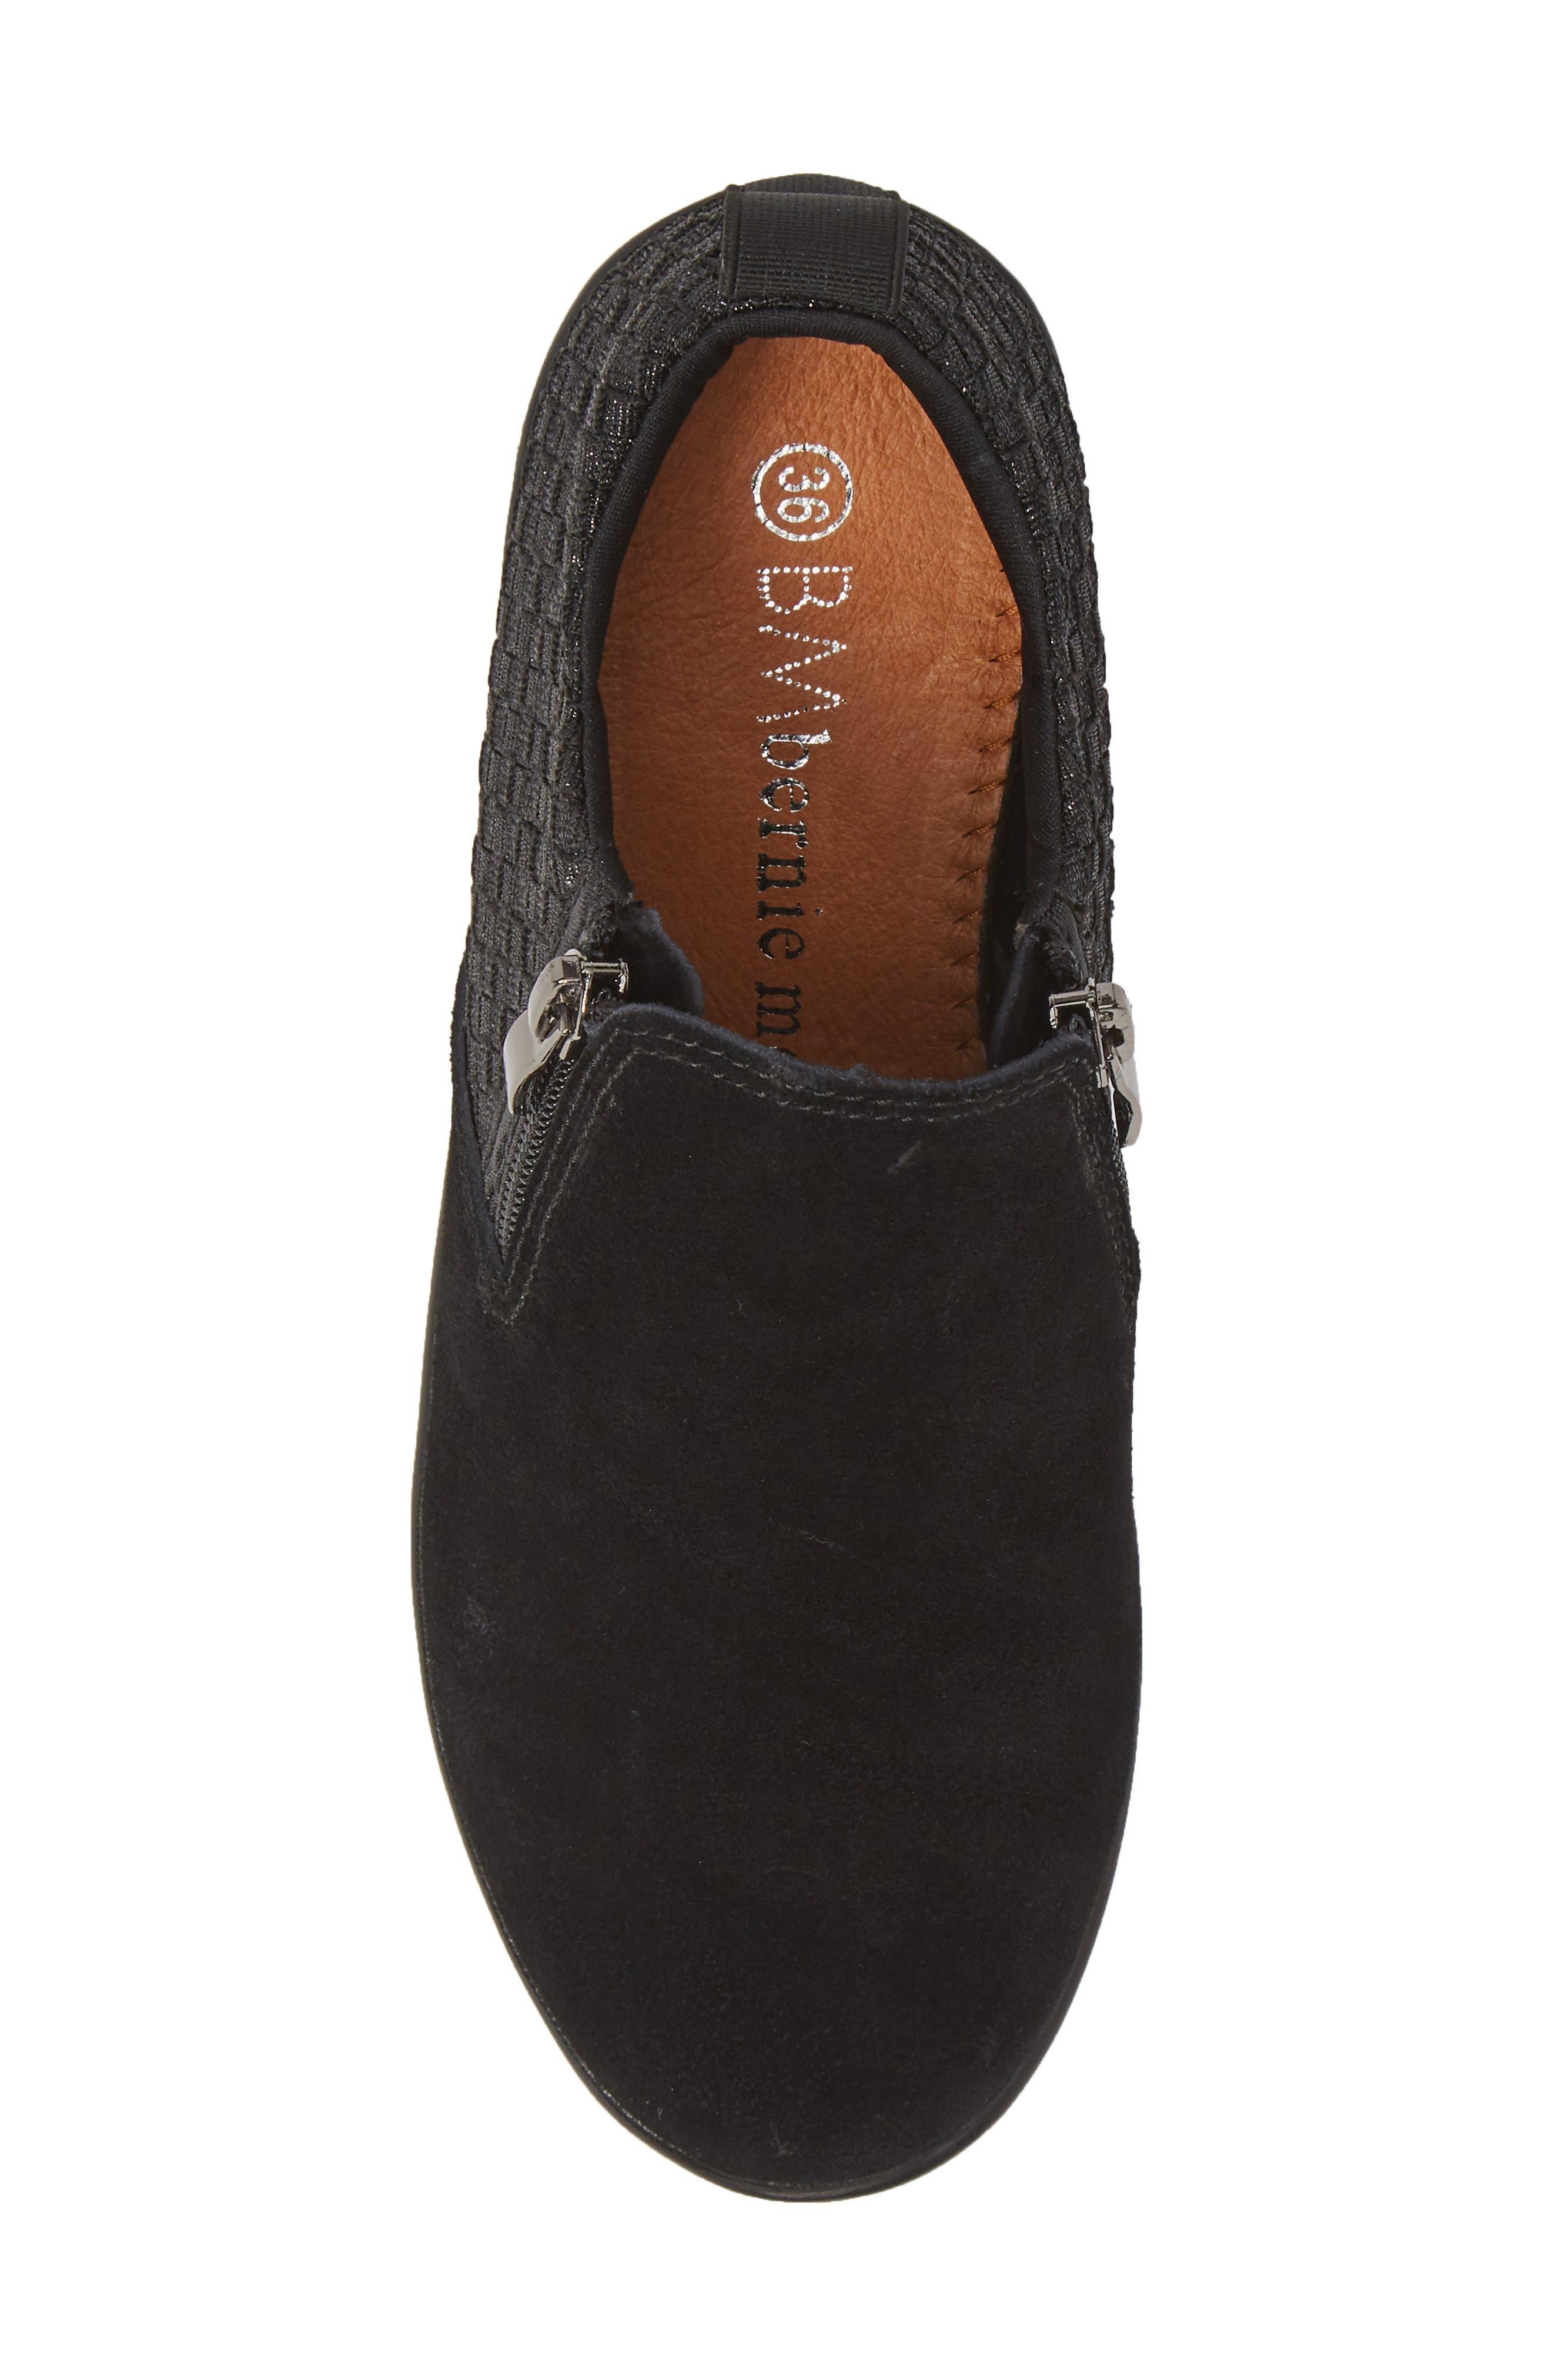 Lihi Ankle Boot,                             Alternate thumbnail 5, color,                             BLACK METALLIC LEATHER